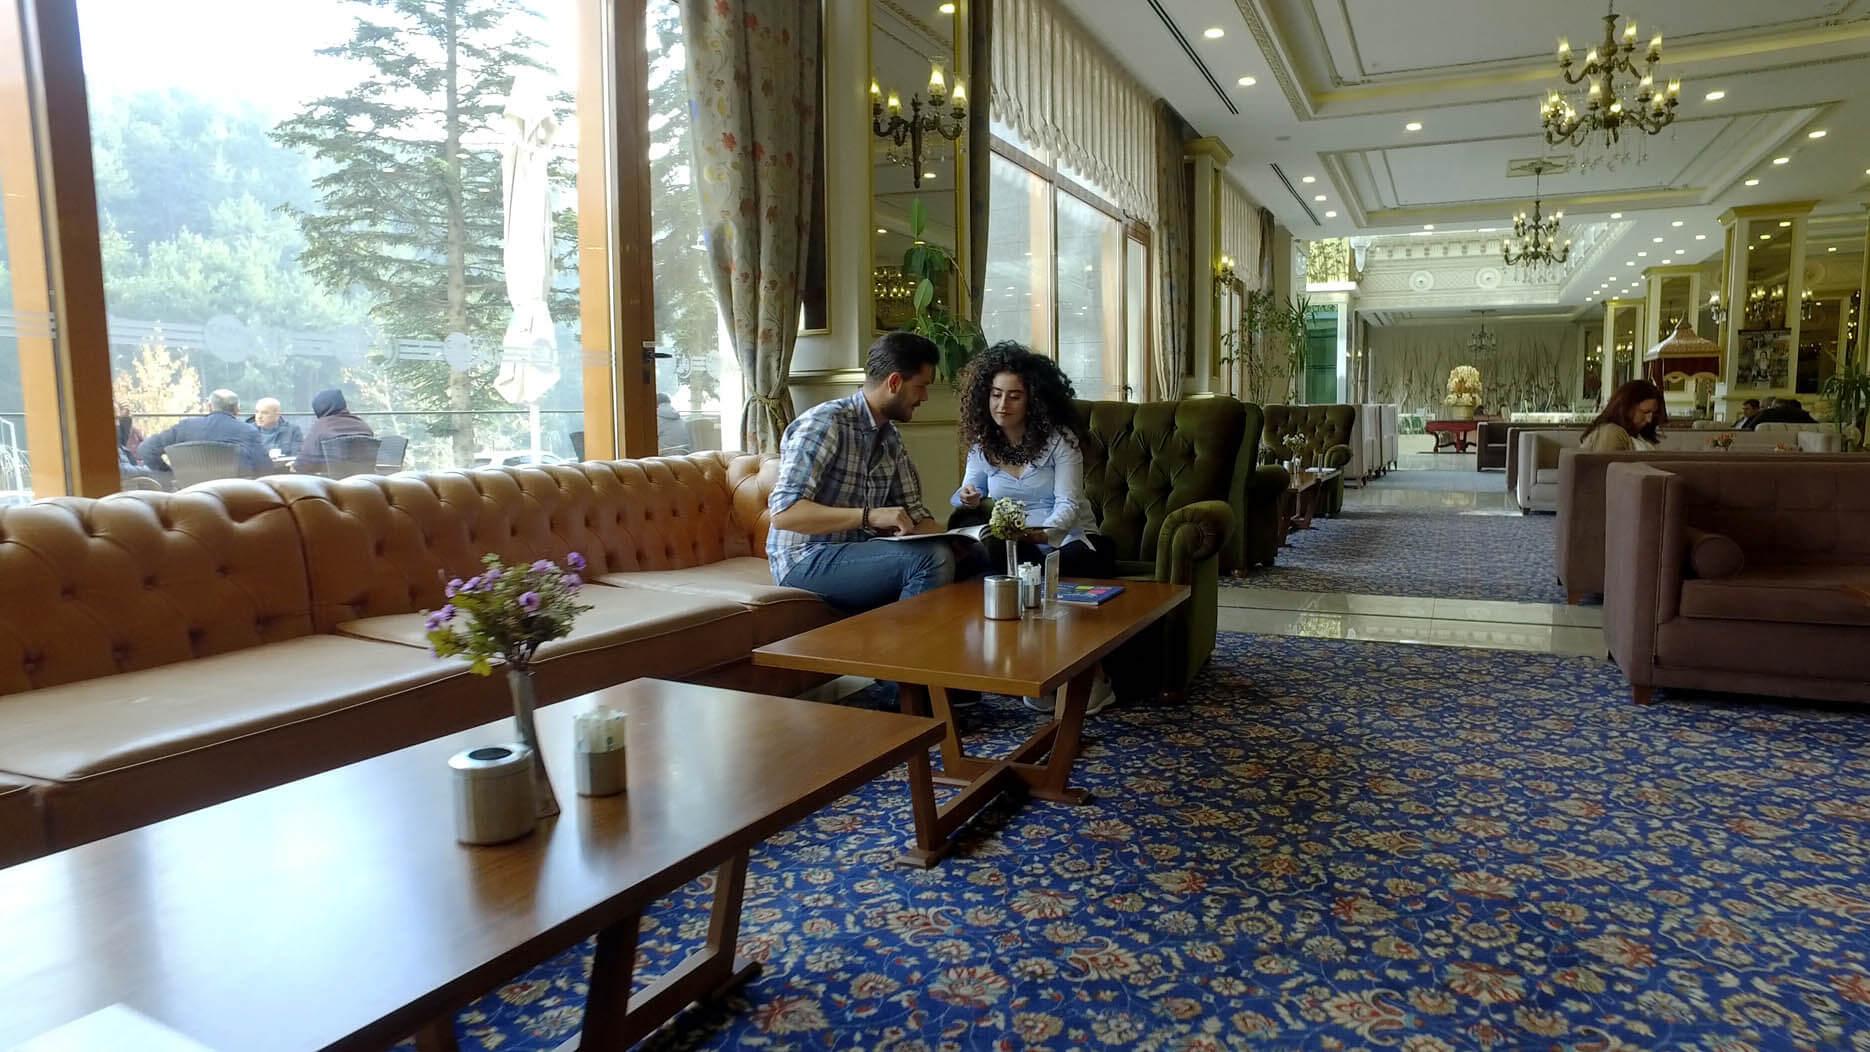 cam-hotel-lobby-lounge-312